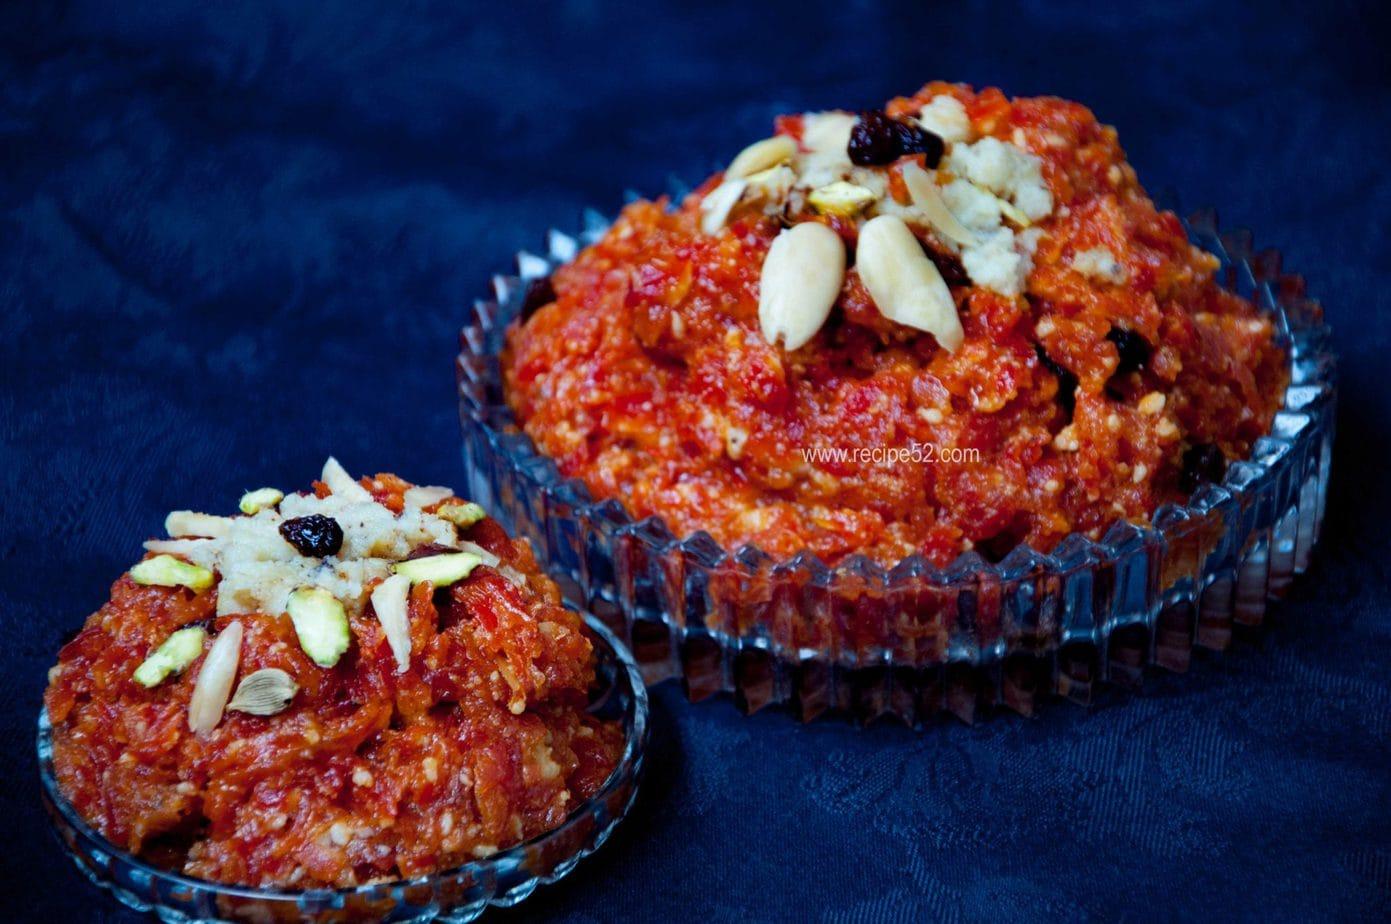 gajar ka halwa served in adish and garnished with nuts.